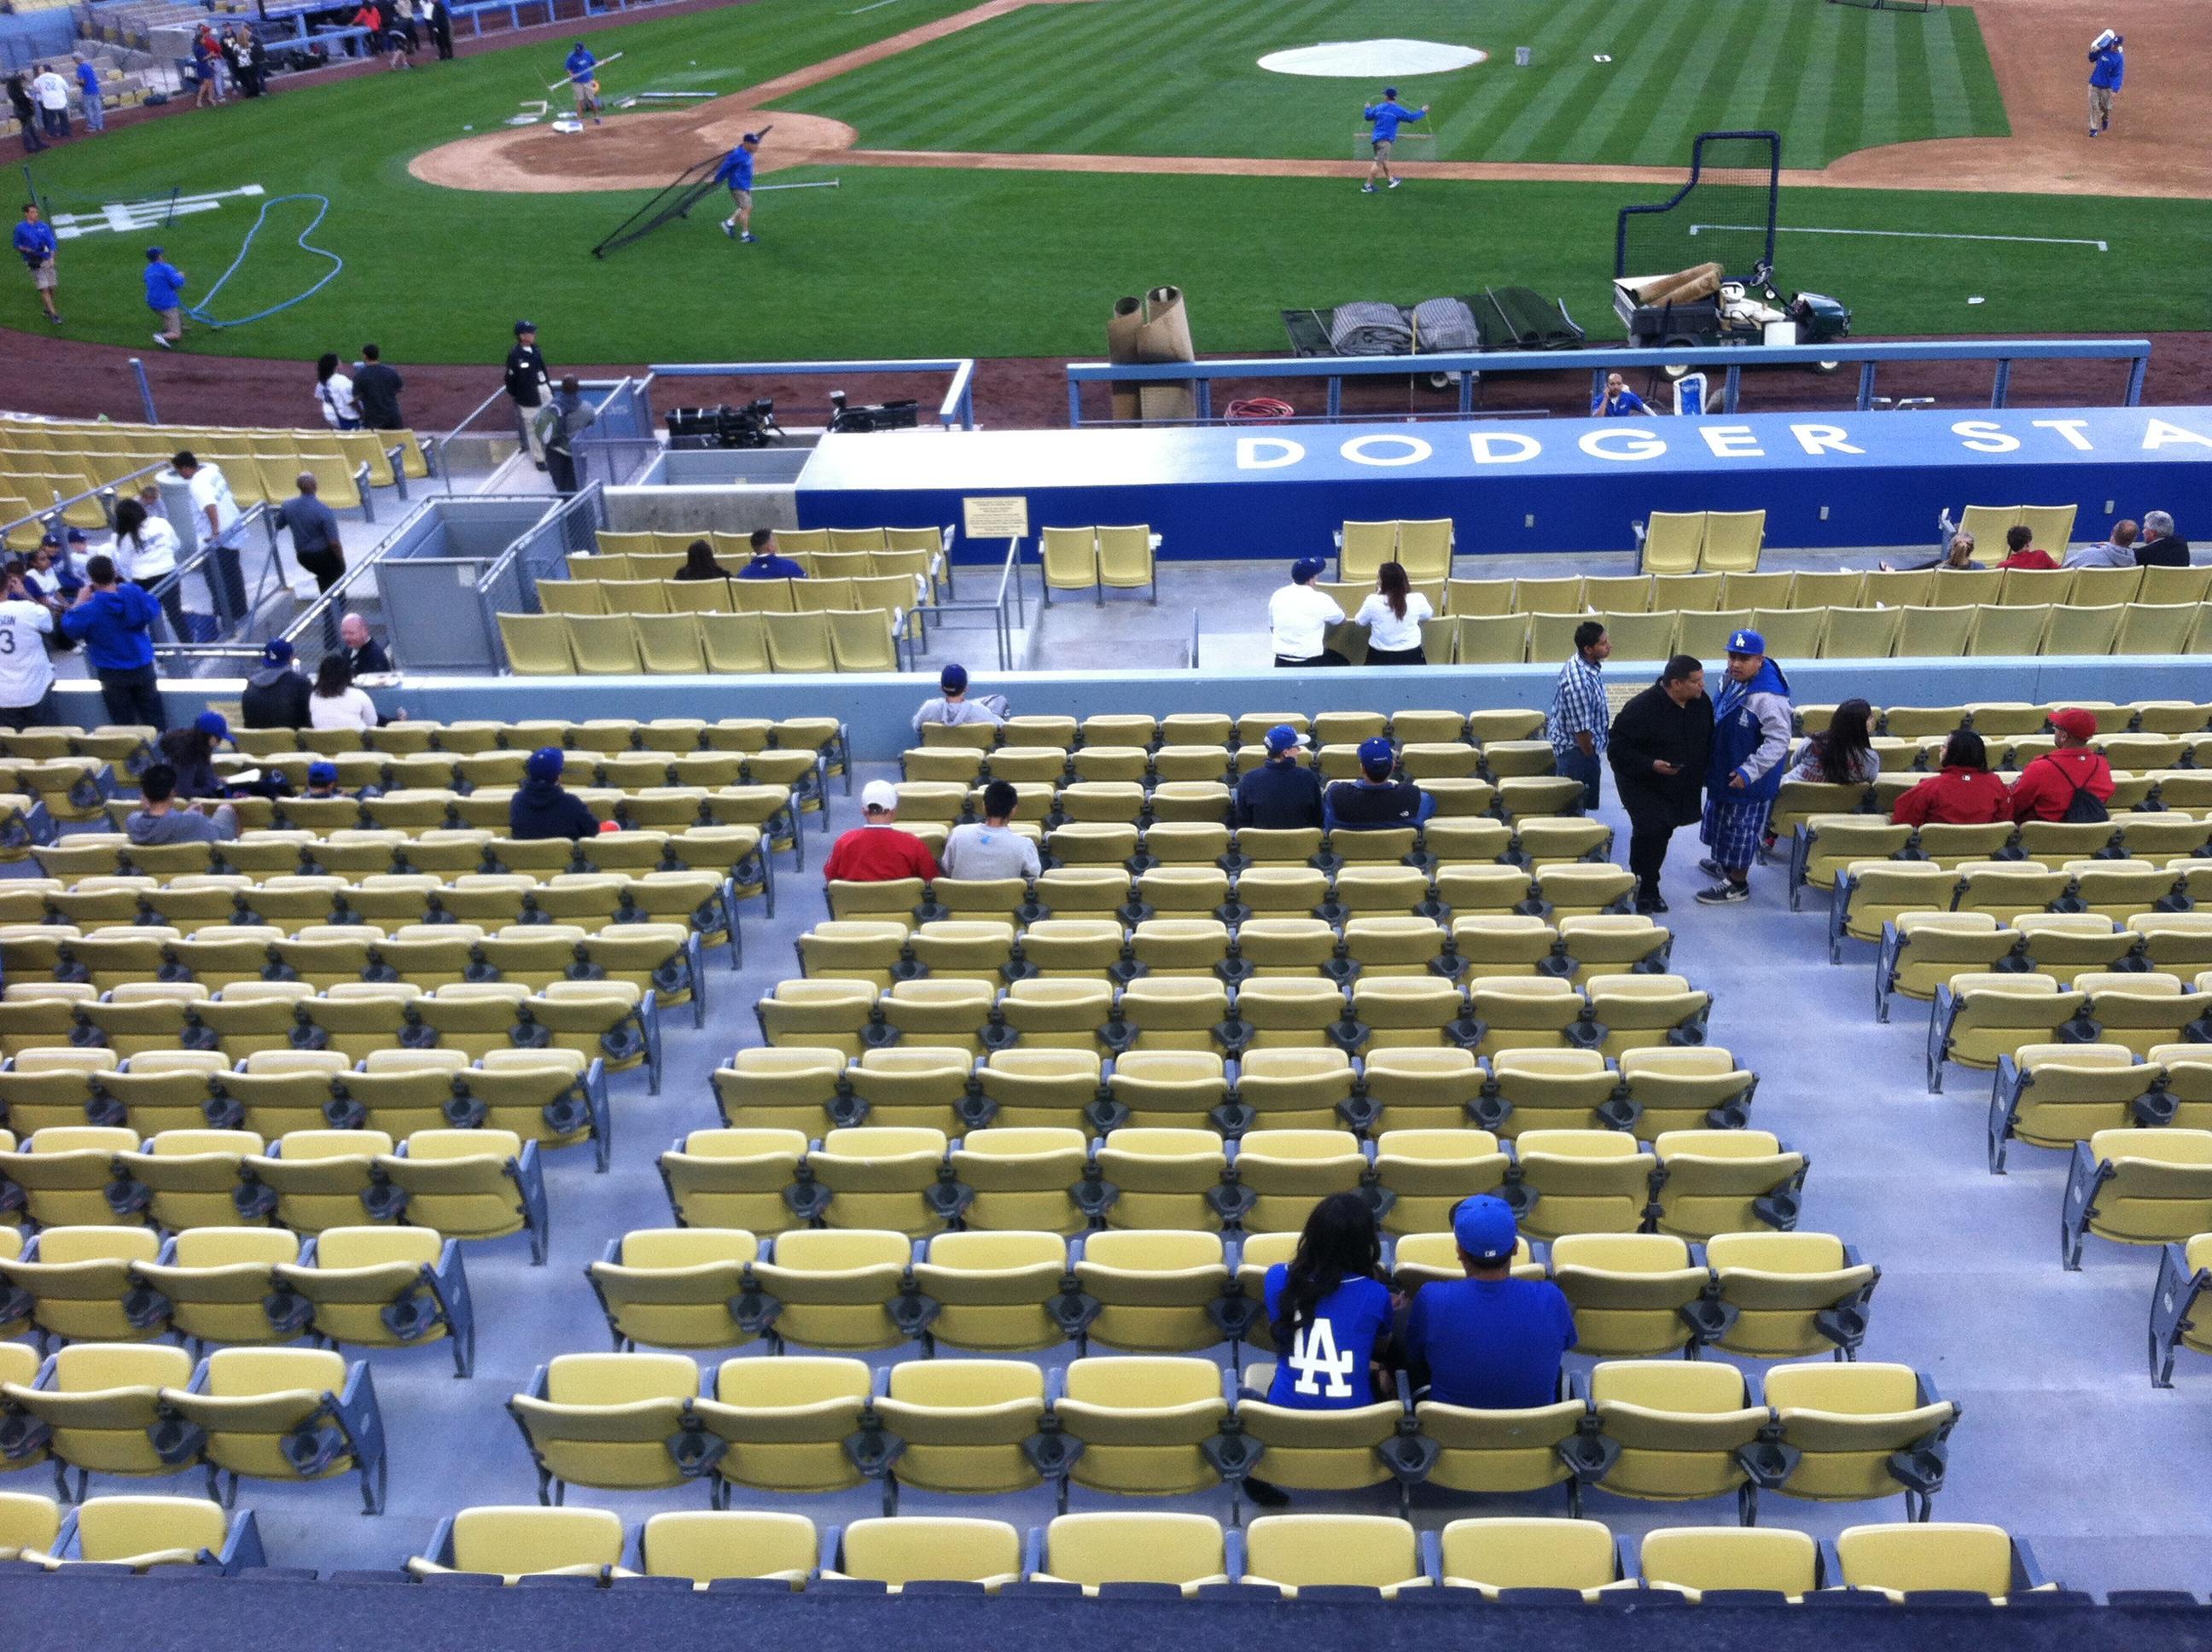 Dodger Stadium Section 132LG Row A Seat 1